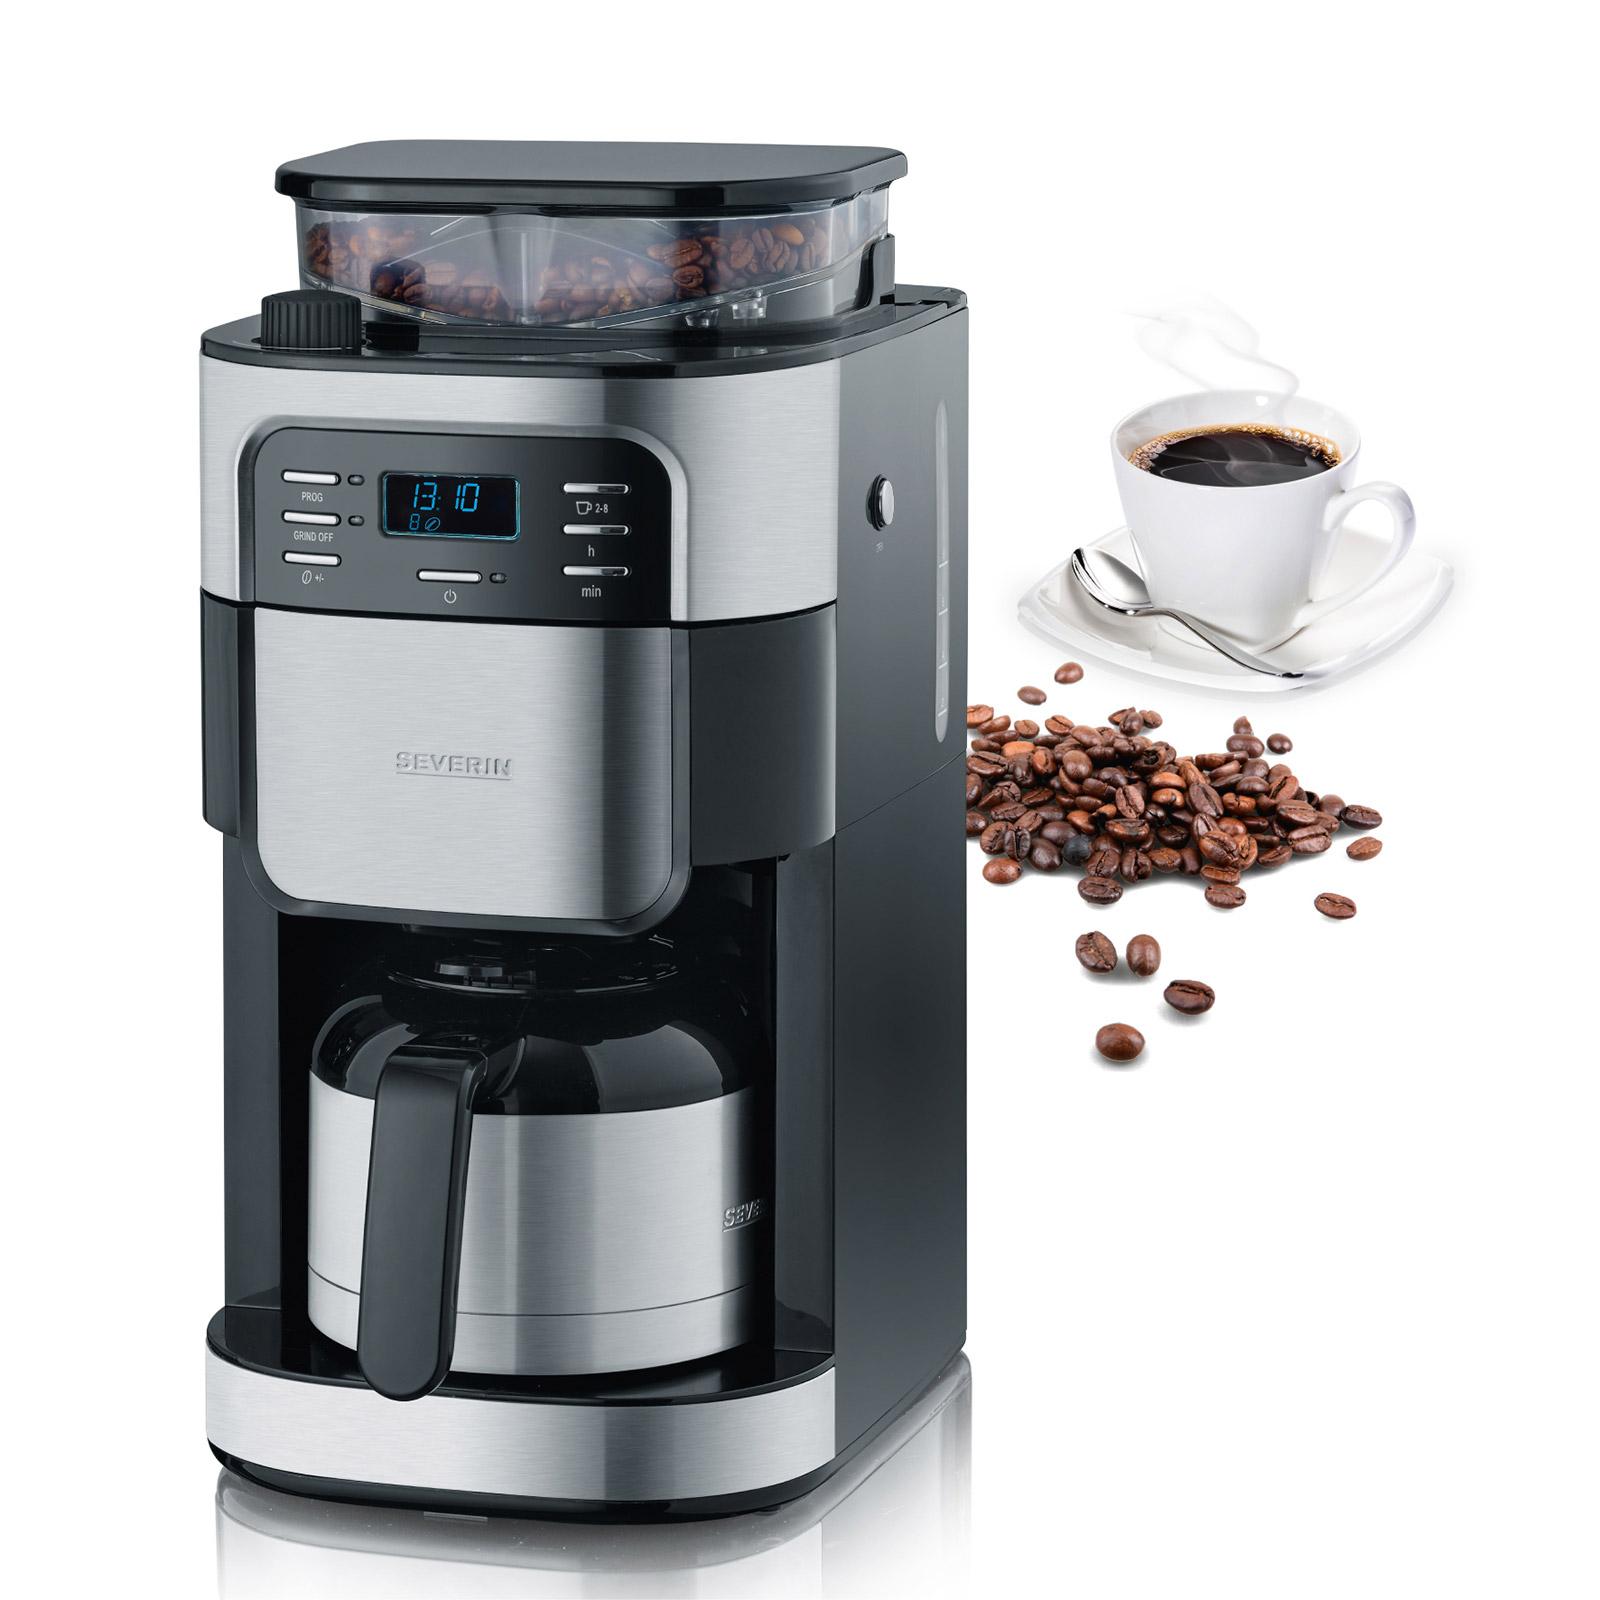 Genuss garantiert: Filterkaffeemaschine mit Mahlwerk KA 4812 mit Thermokanne.